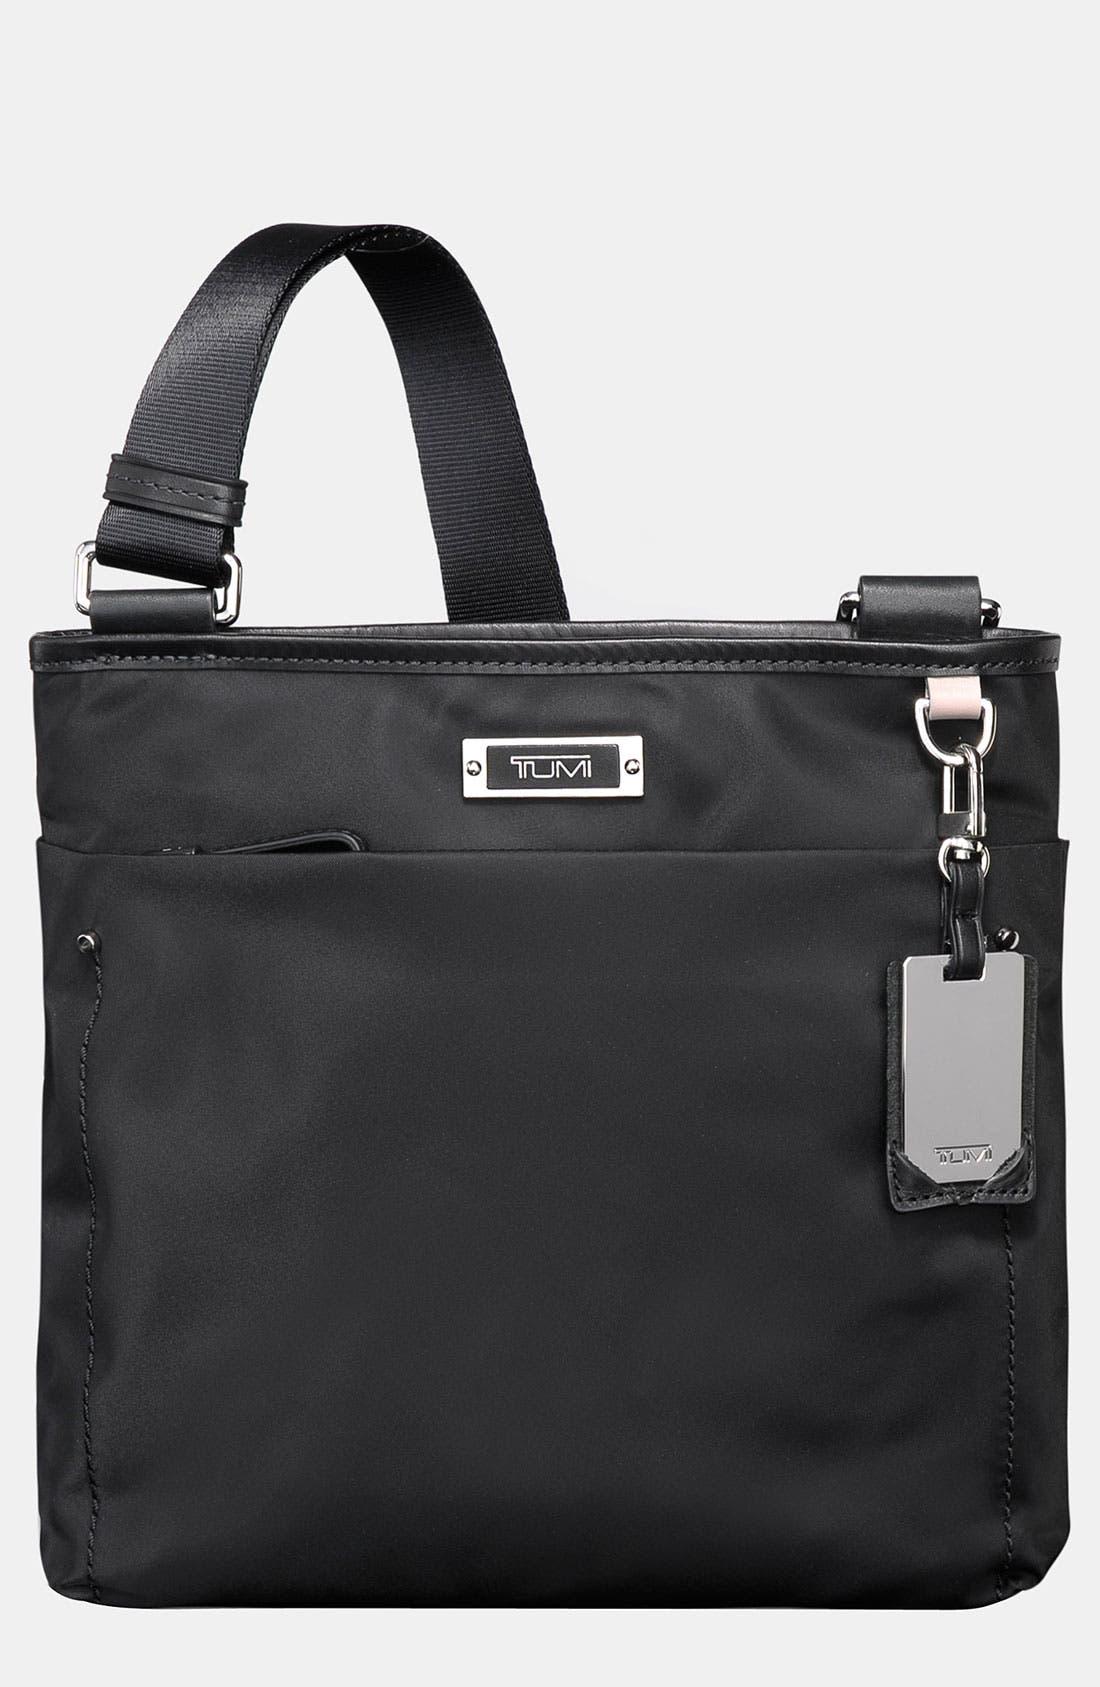 TUMI 'Voyageur - Capri' Crossbody Bag, Main, color, 001